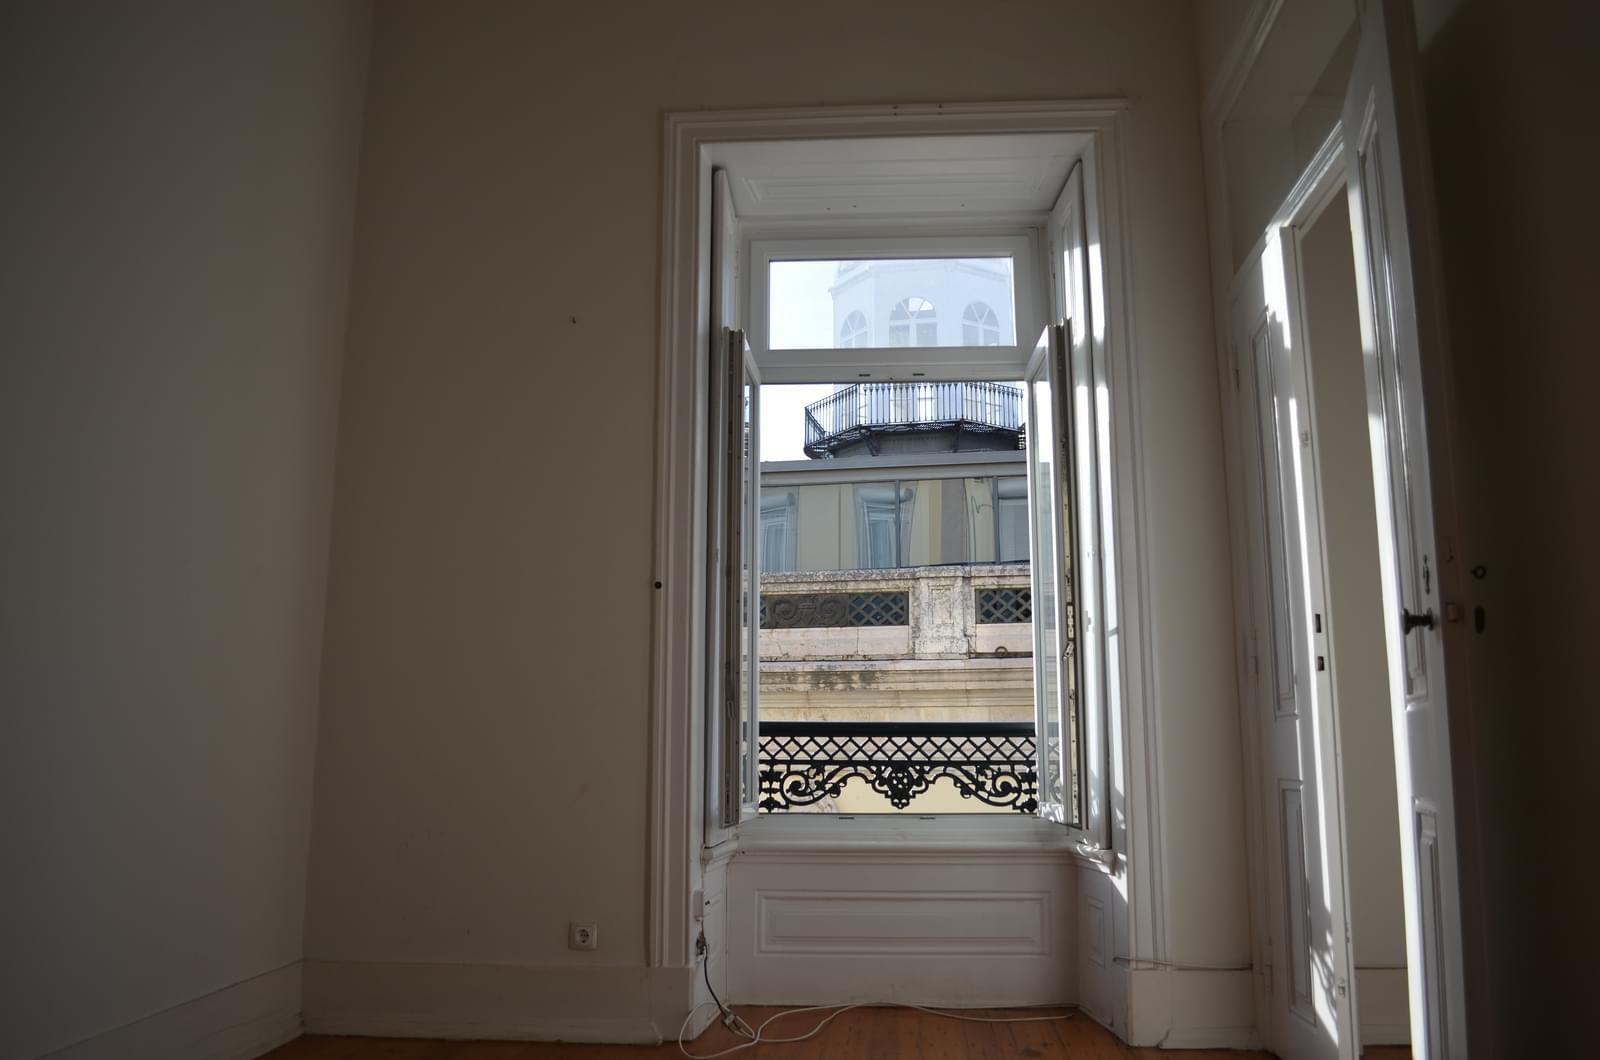 pf18621-apartamento-t4-lisboa-dfc40bea-9466-4355-bf68-794dcadee026